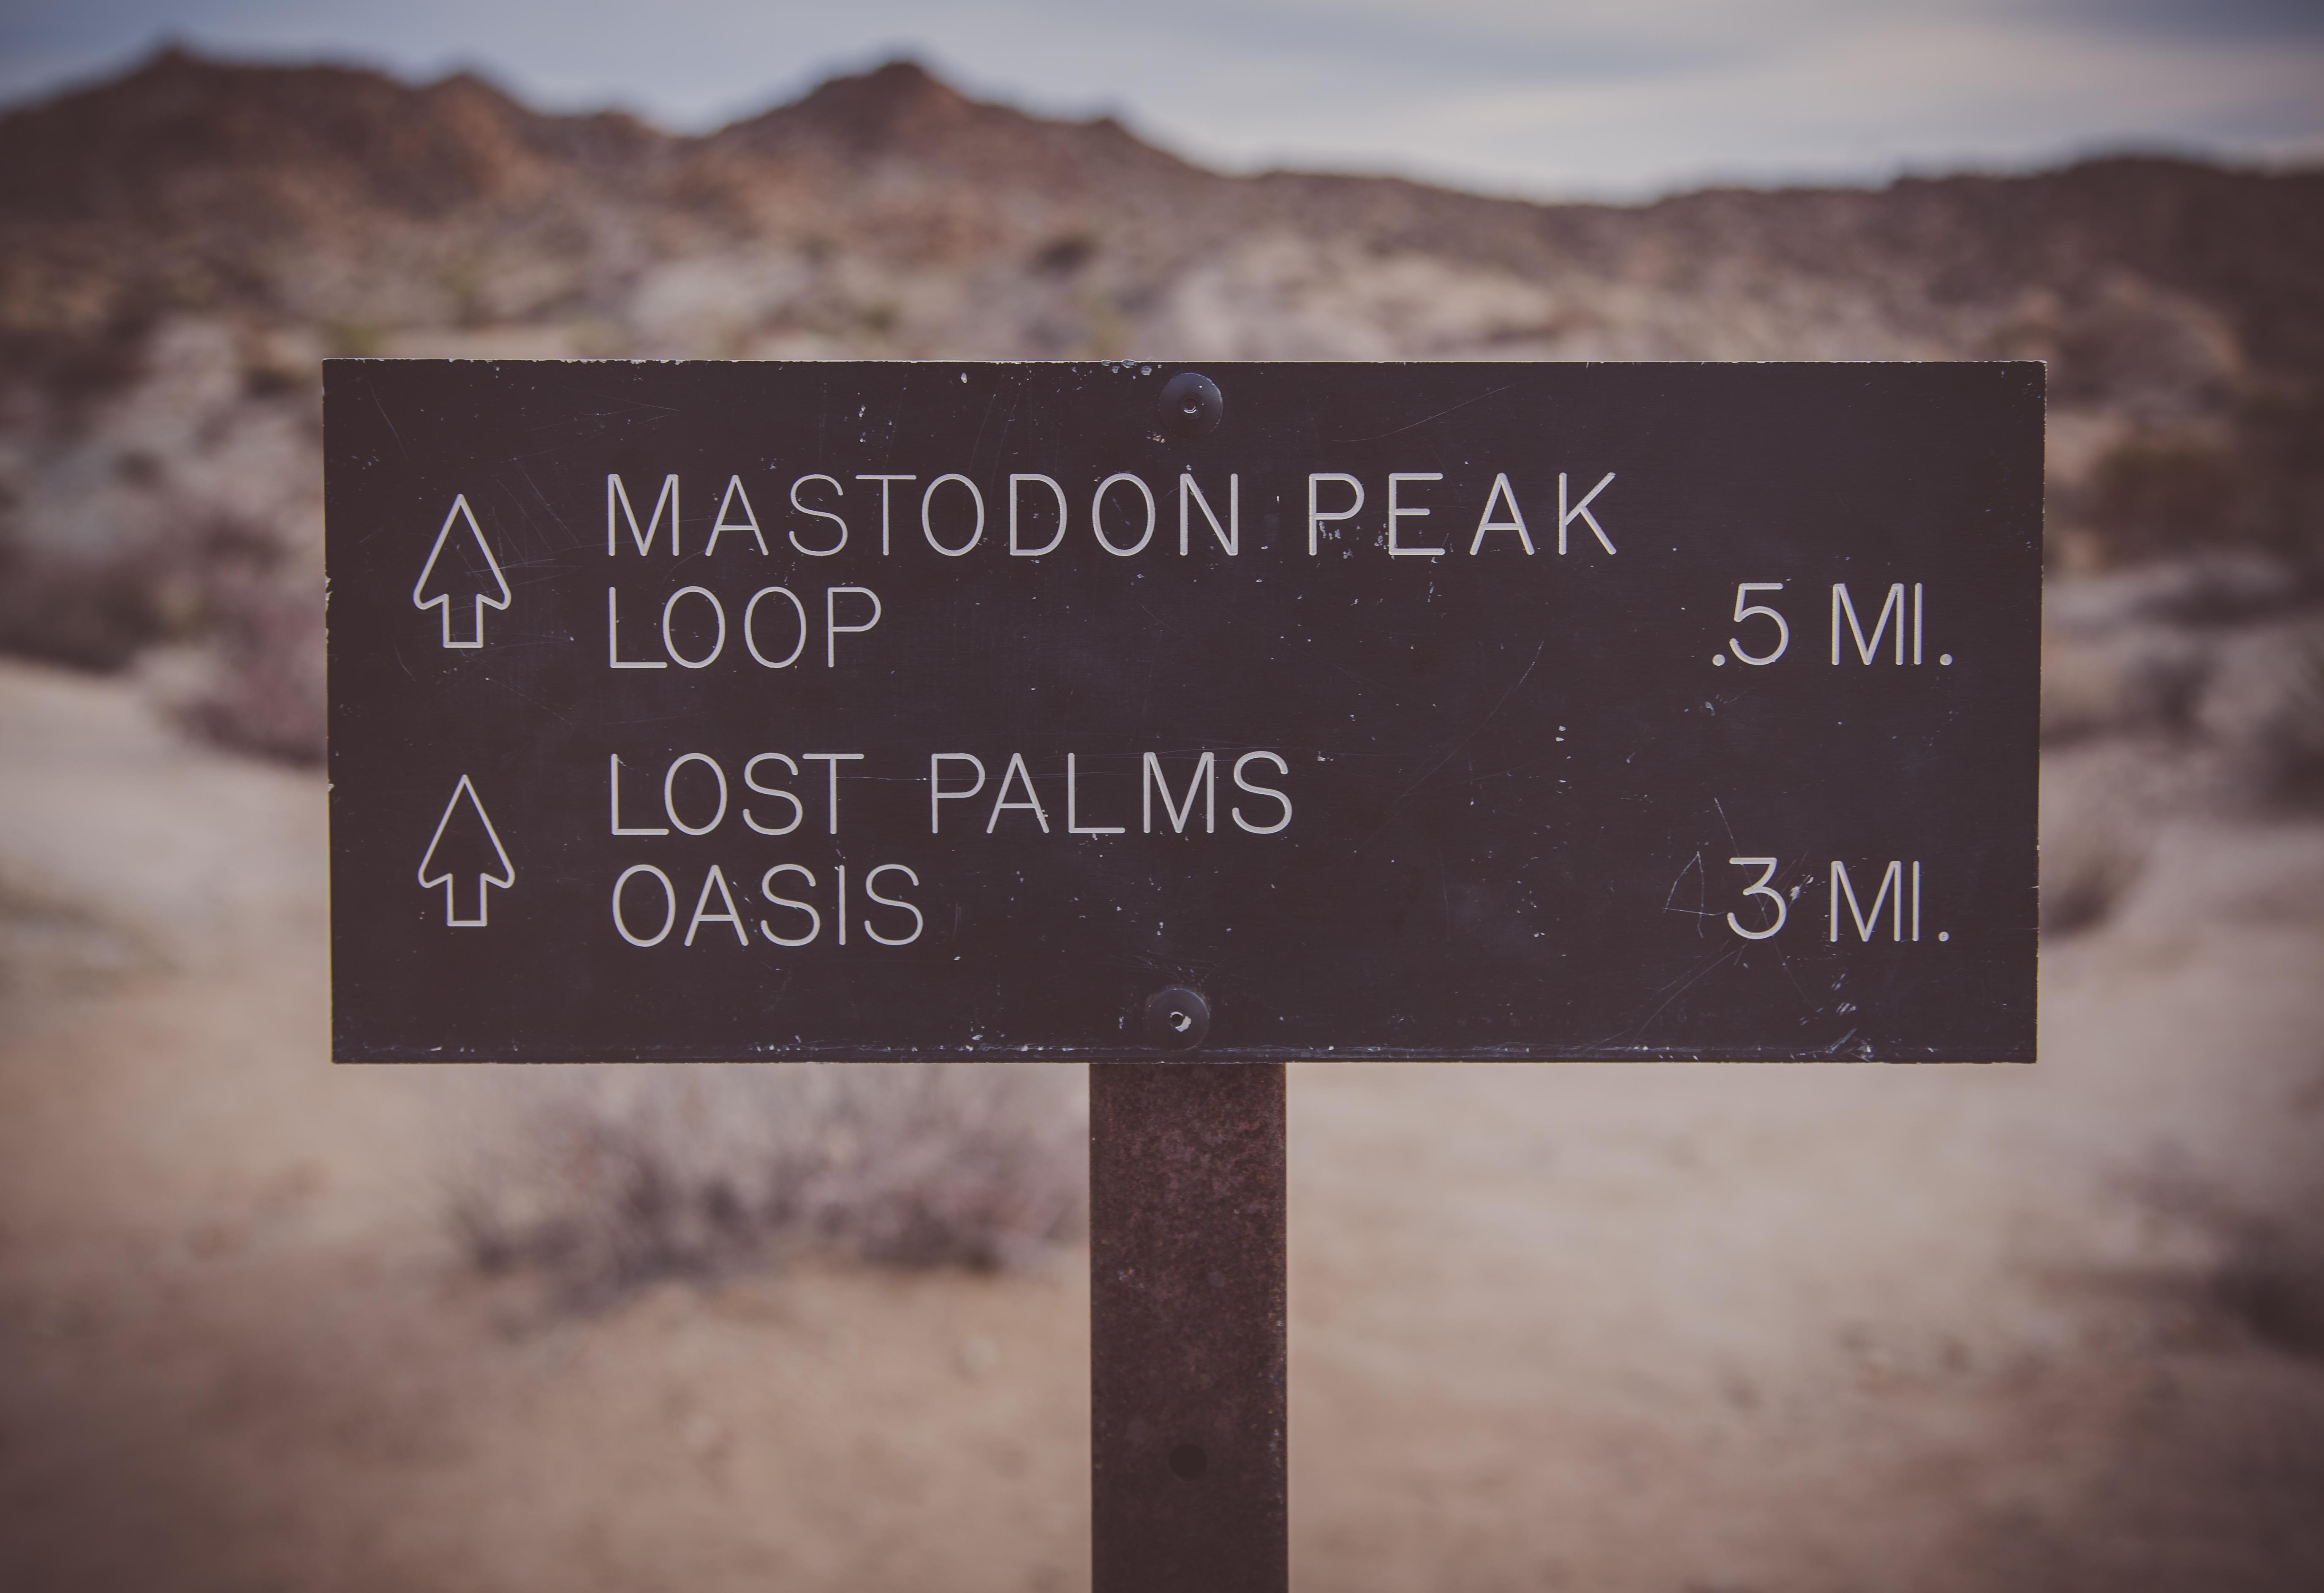 Lost Palms Oasis Trail Joshua Tree National Park Wikipedia